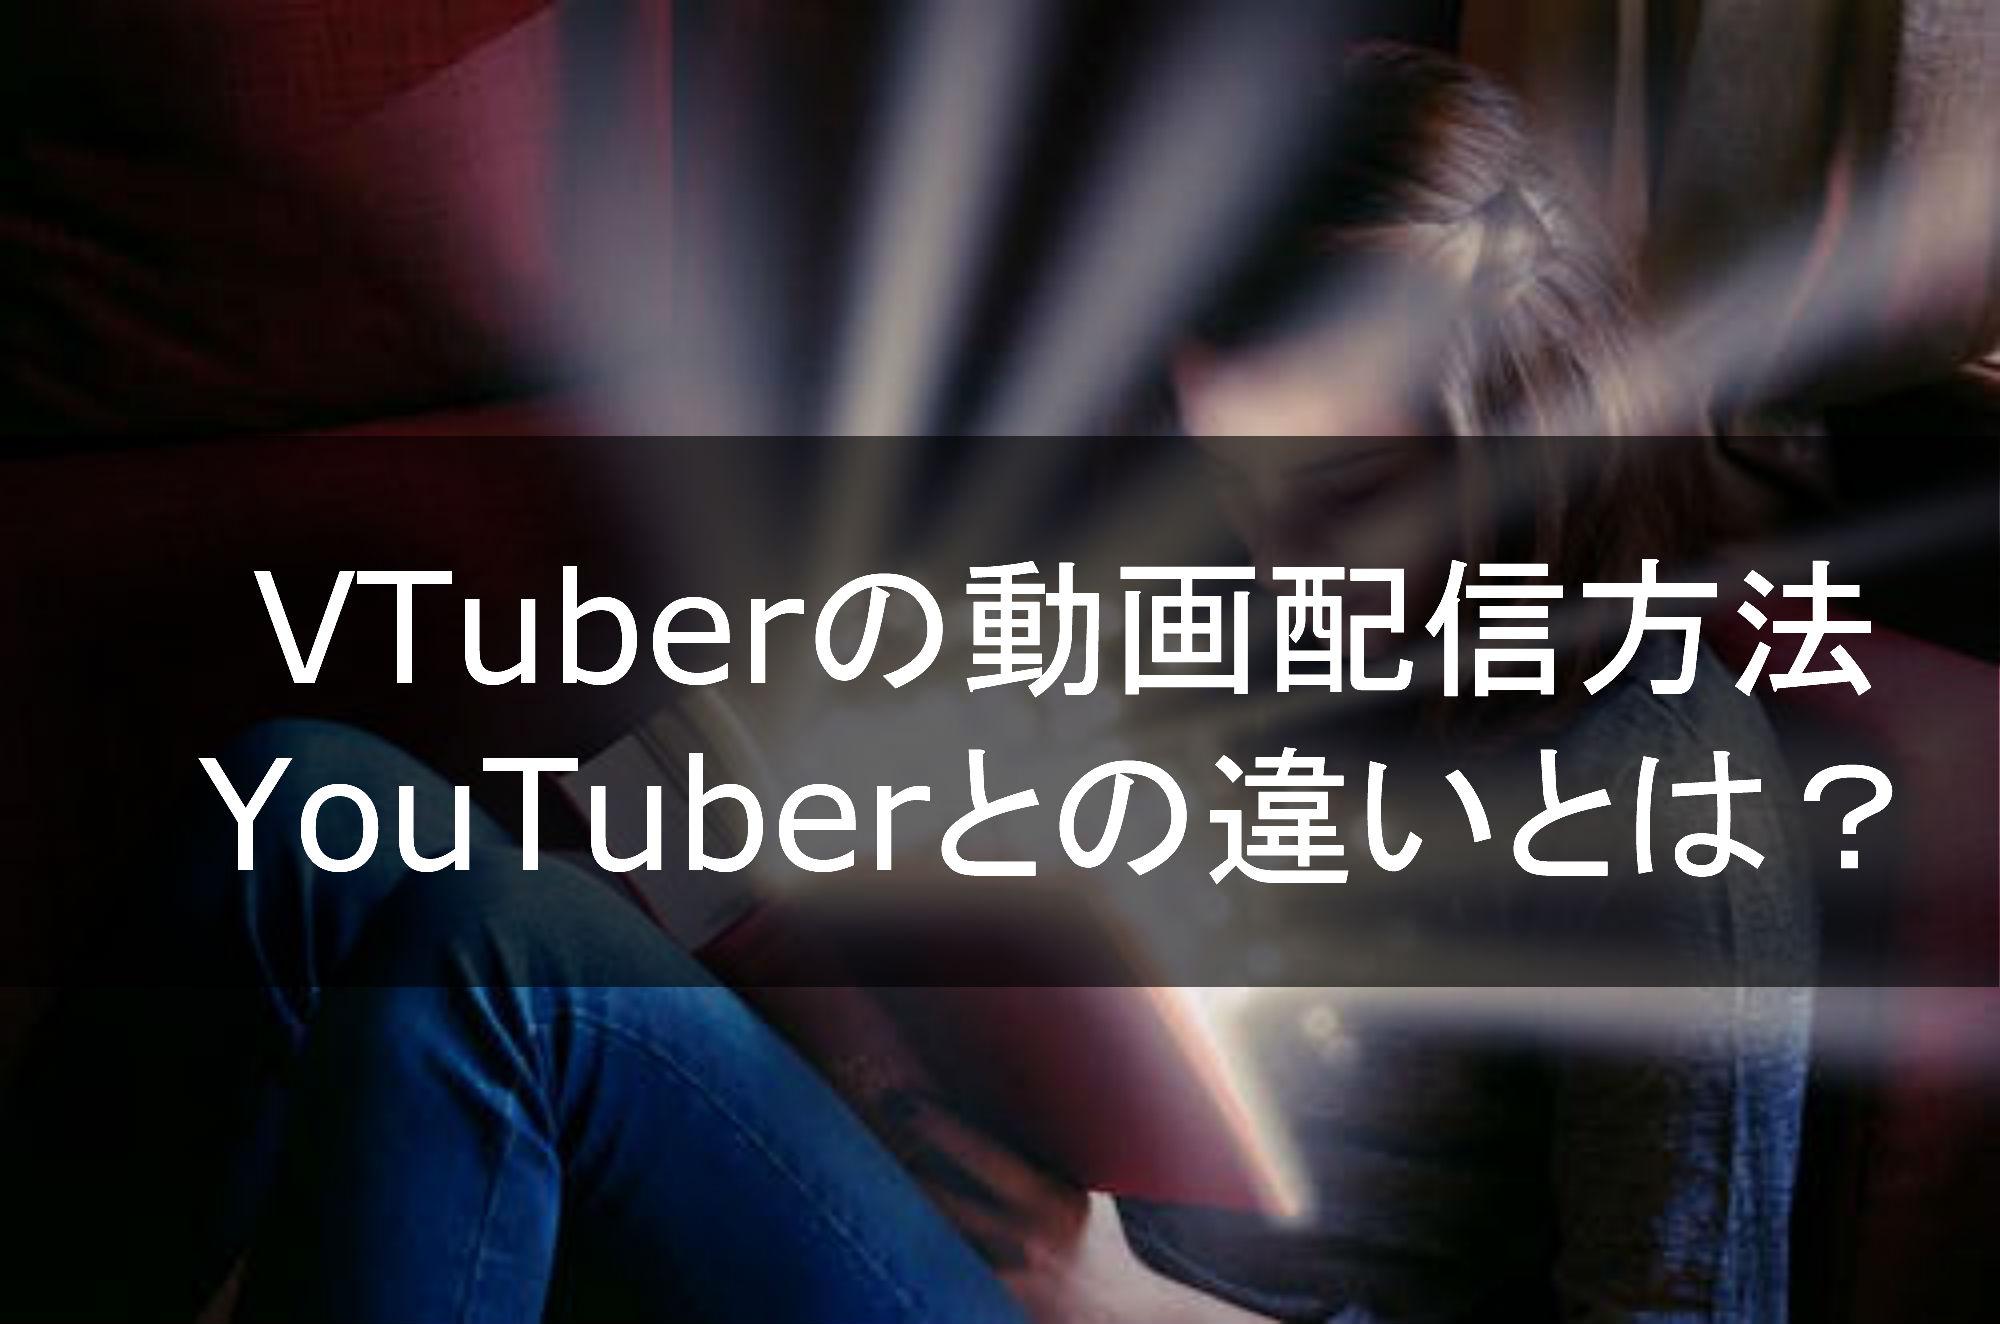 VTuberの動画配信方法、YouTuberとの違いとは?